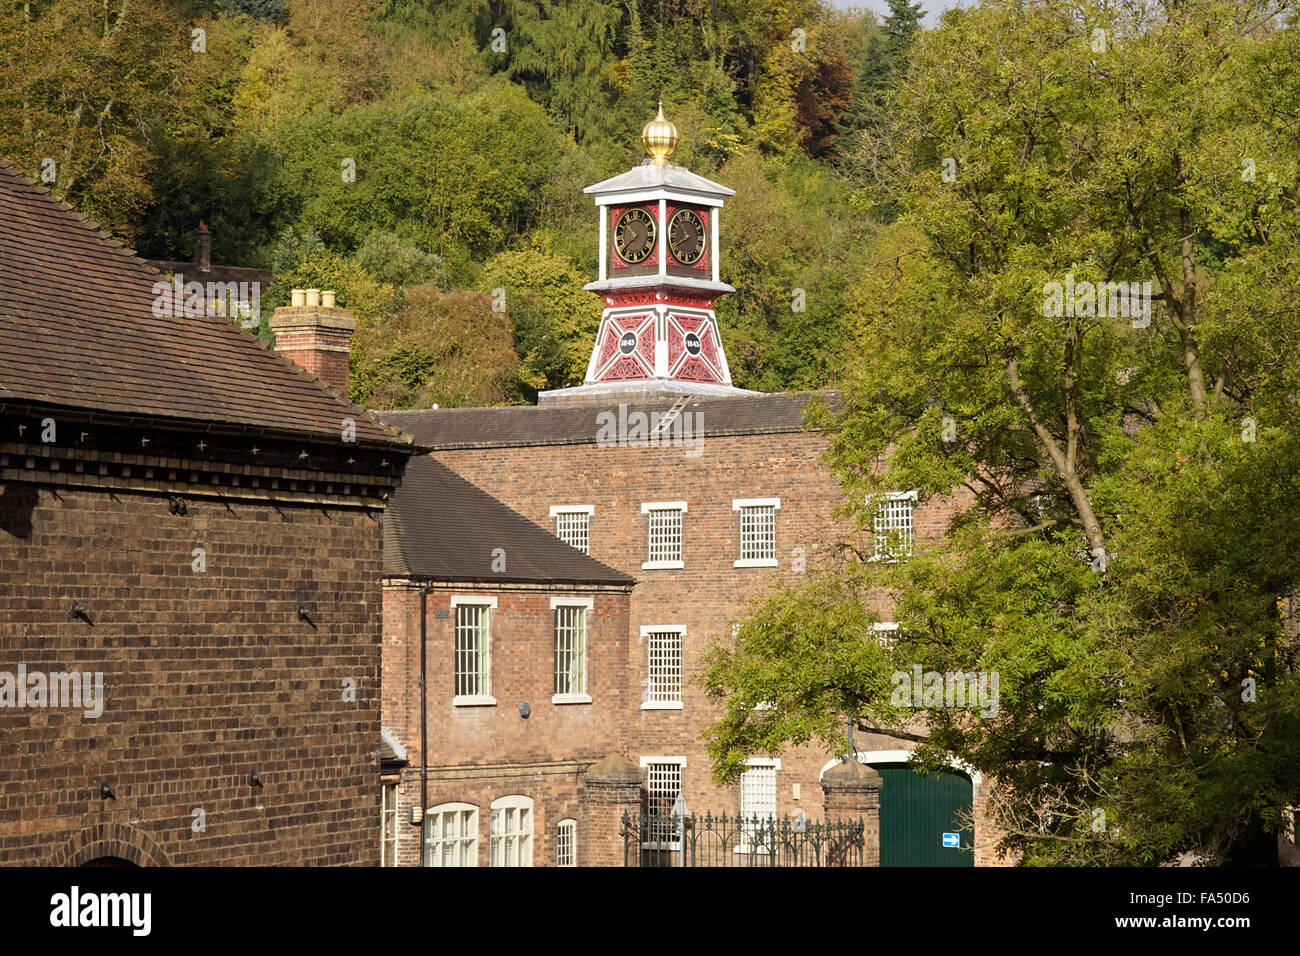 The clock tower at Engenuity in Coalbrookdale, Ironbridge, Shropshire, UK - Stock Image